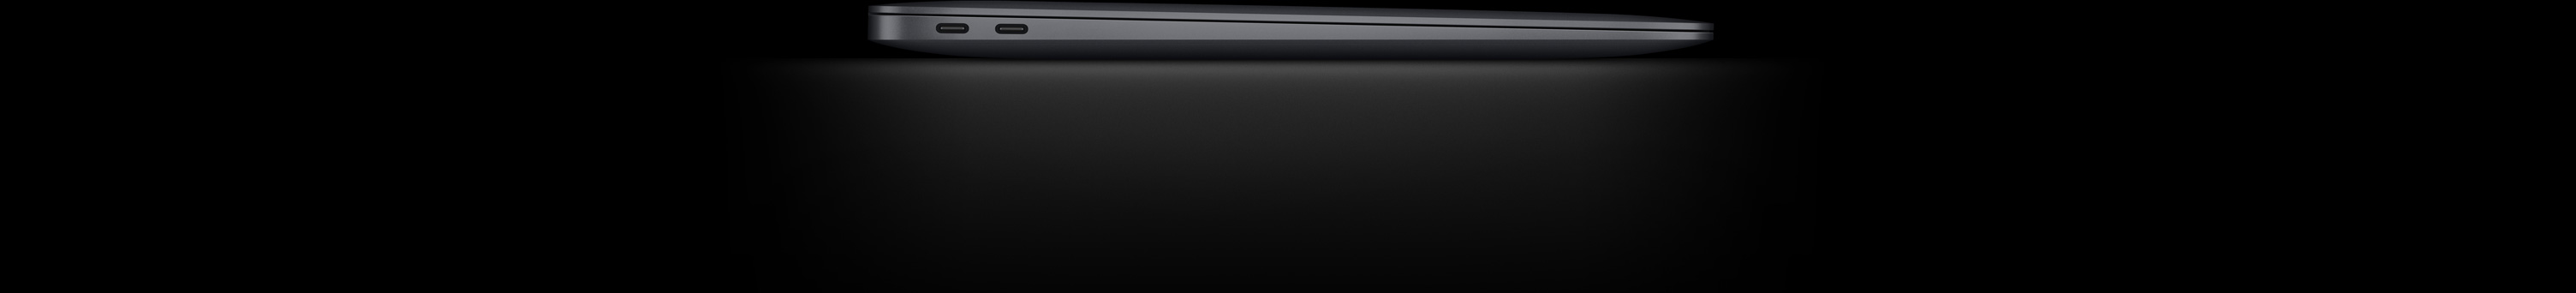 MacBook Air Connectivity